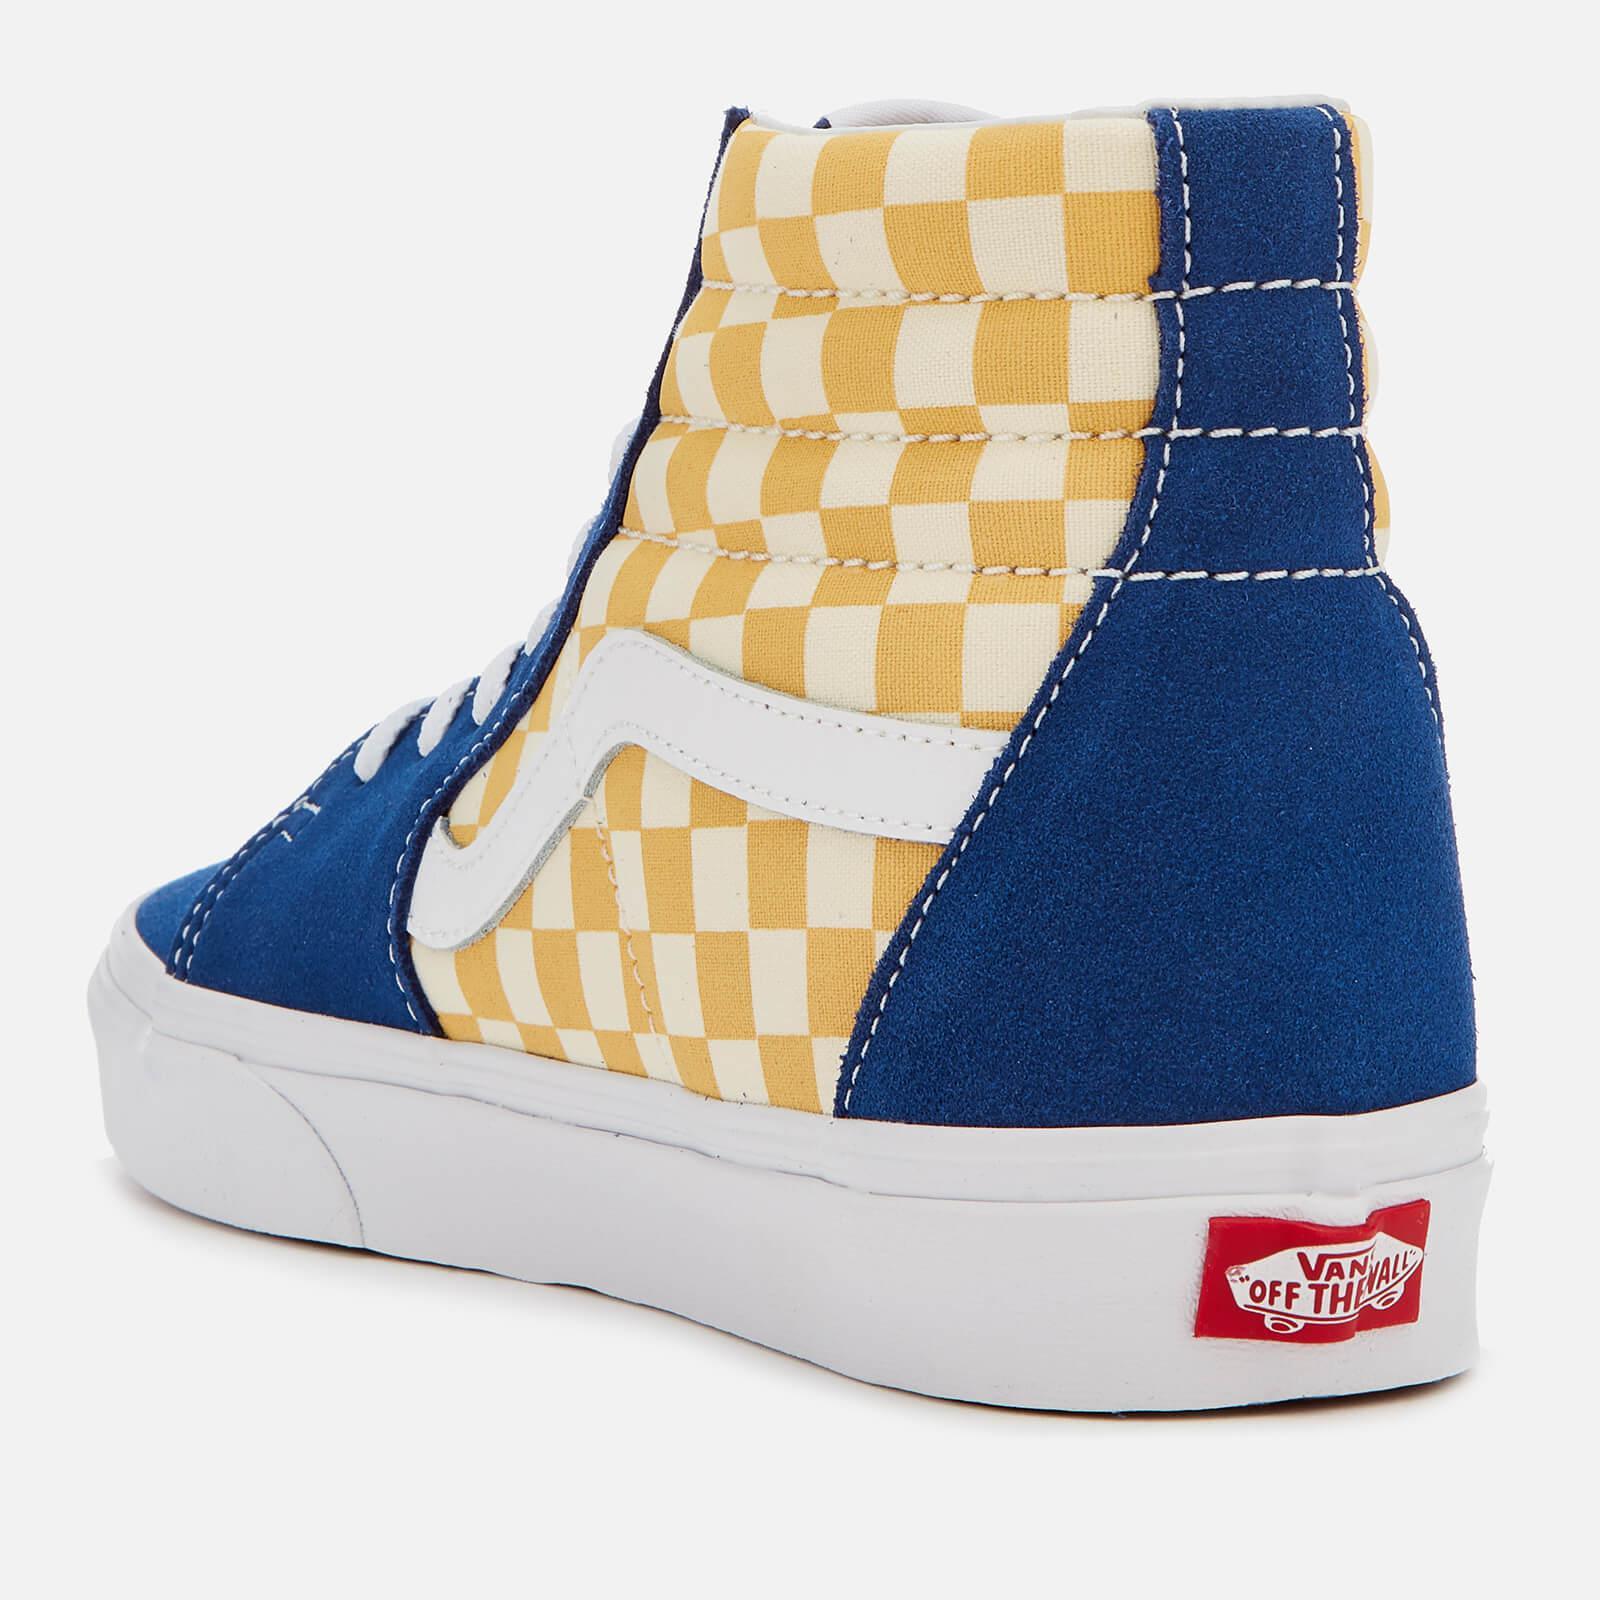 Vans Suede Sk8-hi Bmx Checkerboard Trainers in Blue for Men